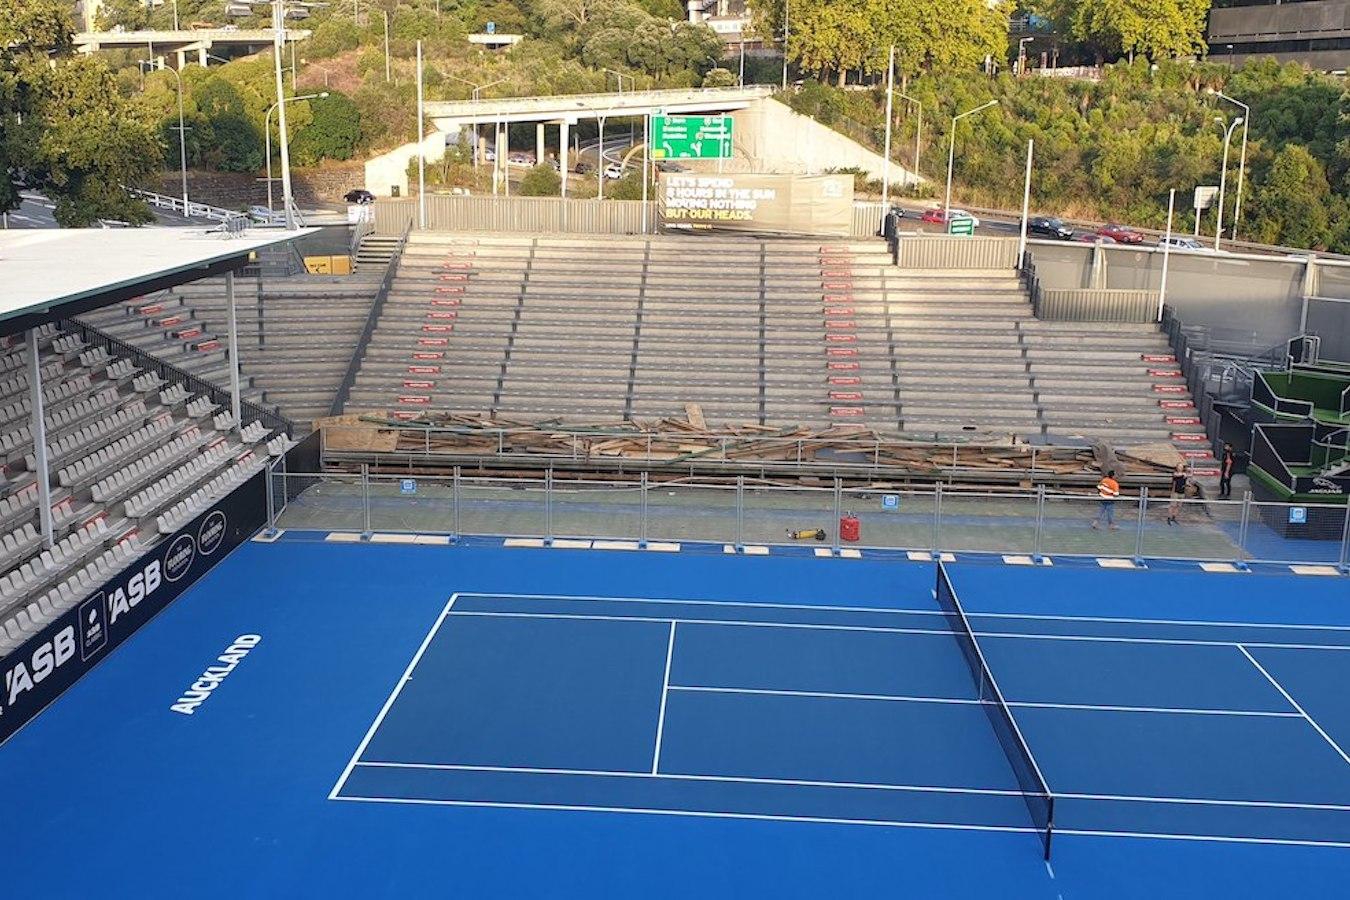 ASB Tennis Arena - Yock Stand